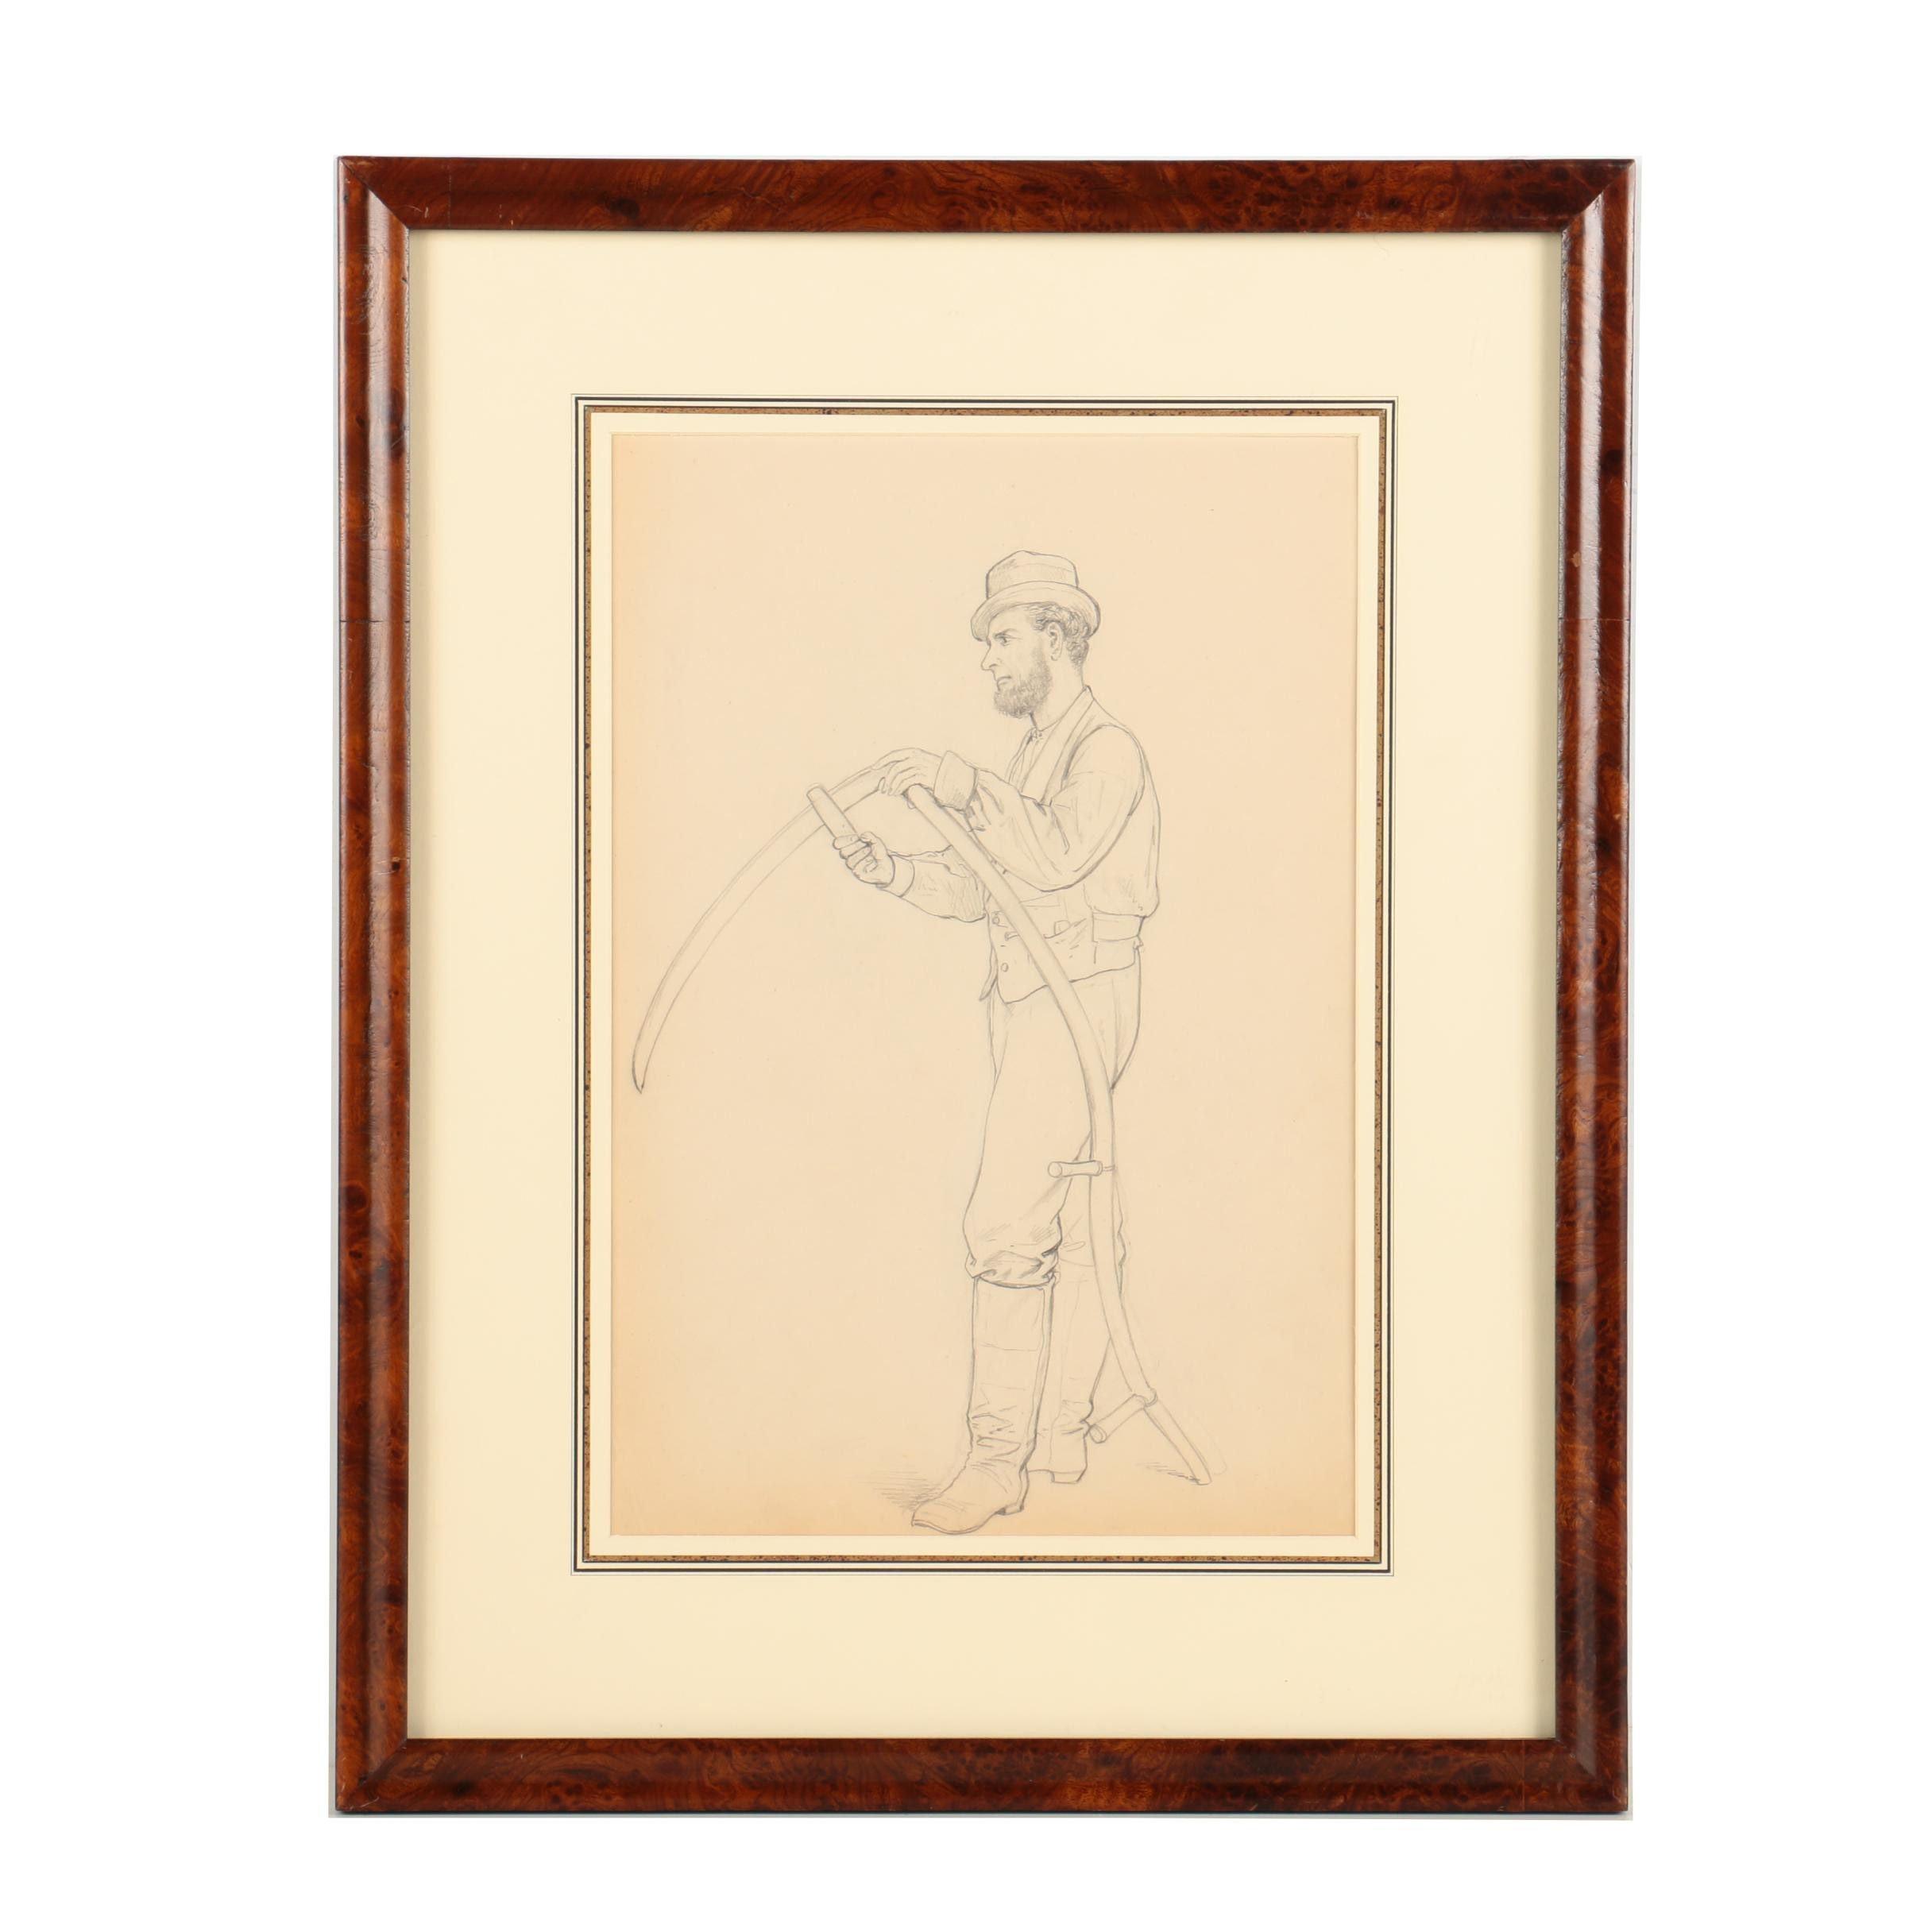 "Graphite Drawing Attributed to Edmund Birckhead Bensell ""Farmer with Scythe"""